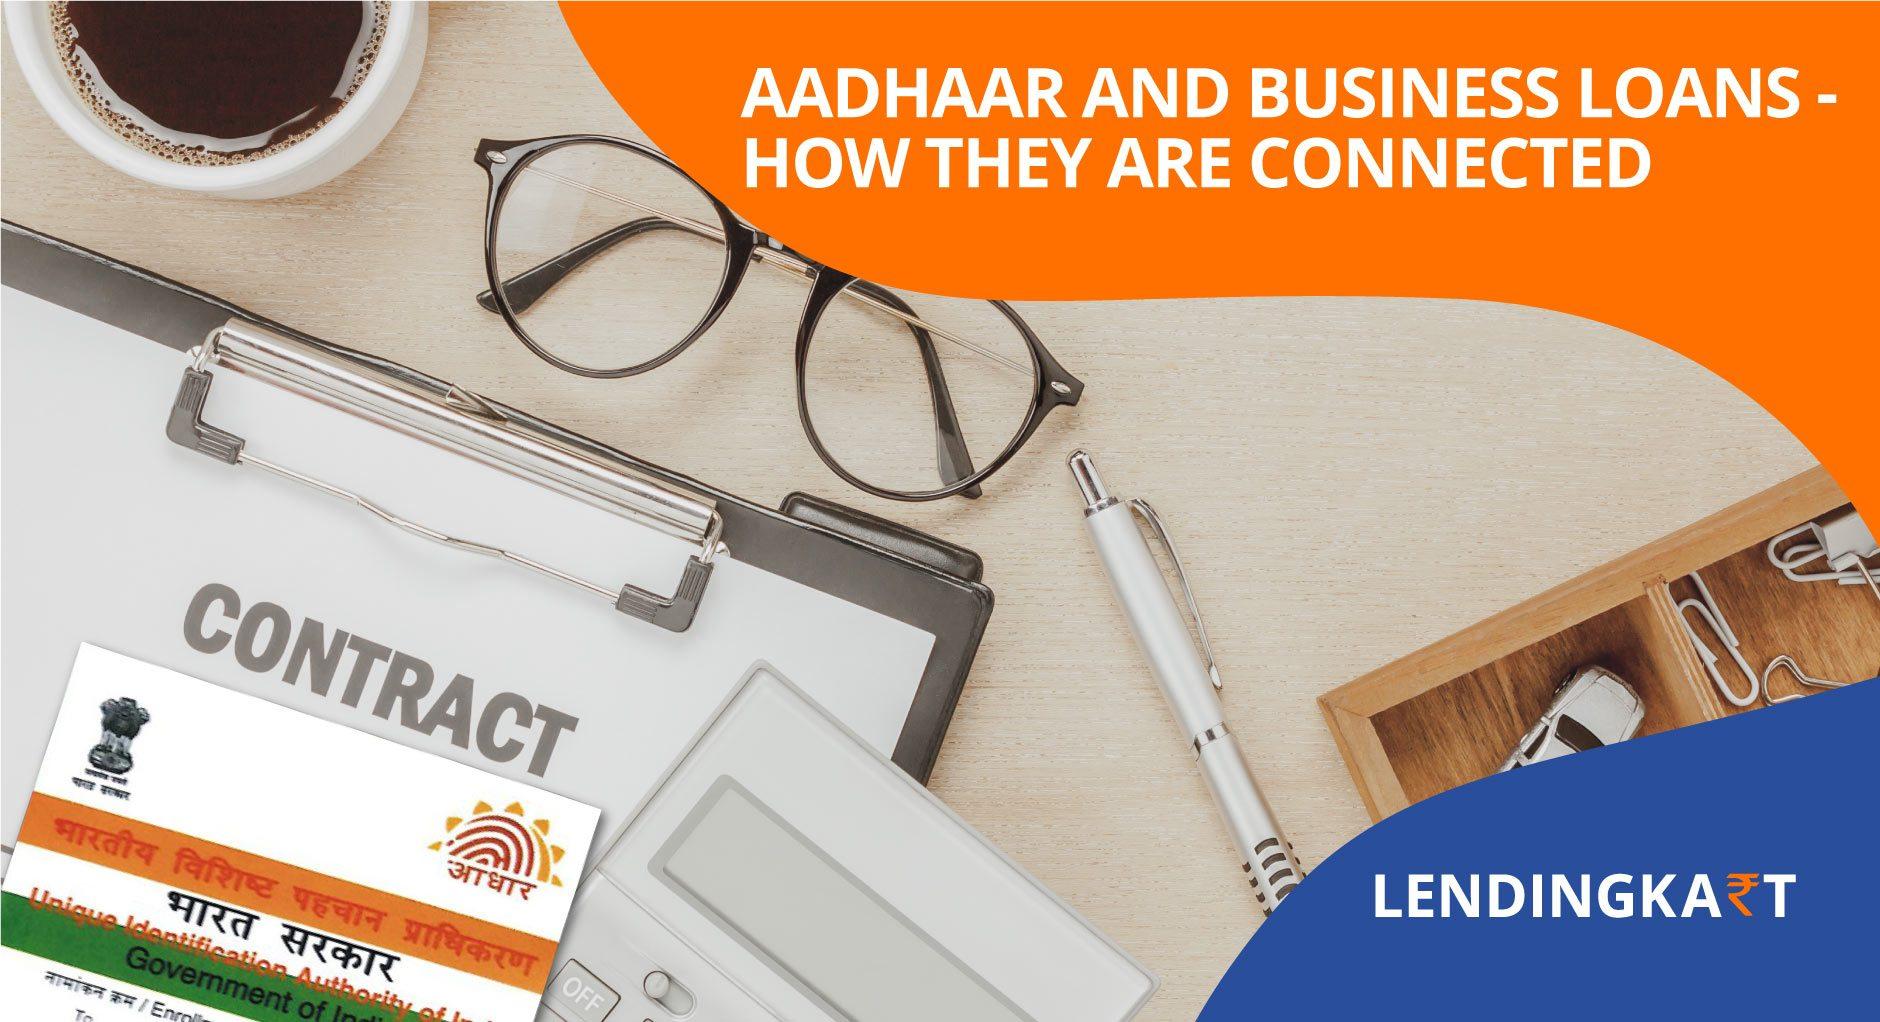 Aadhaar for Business Loans